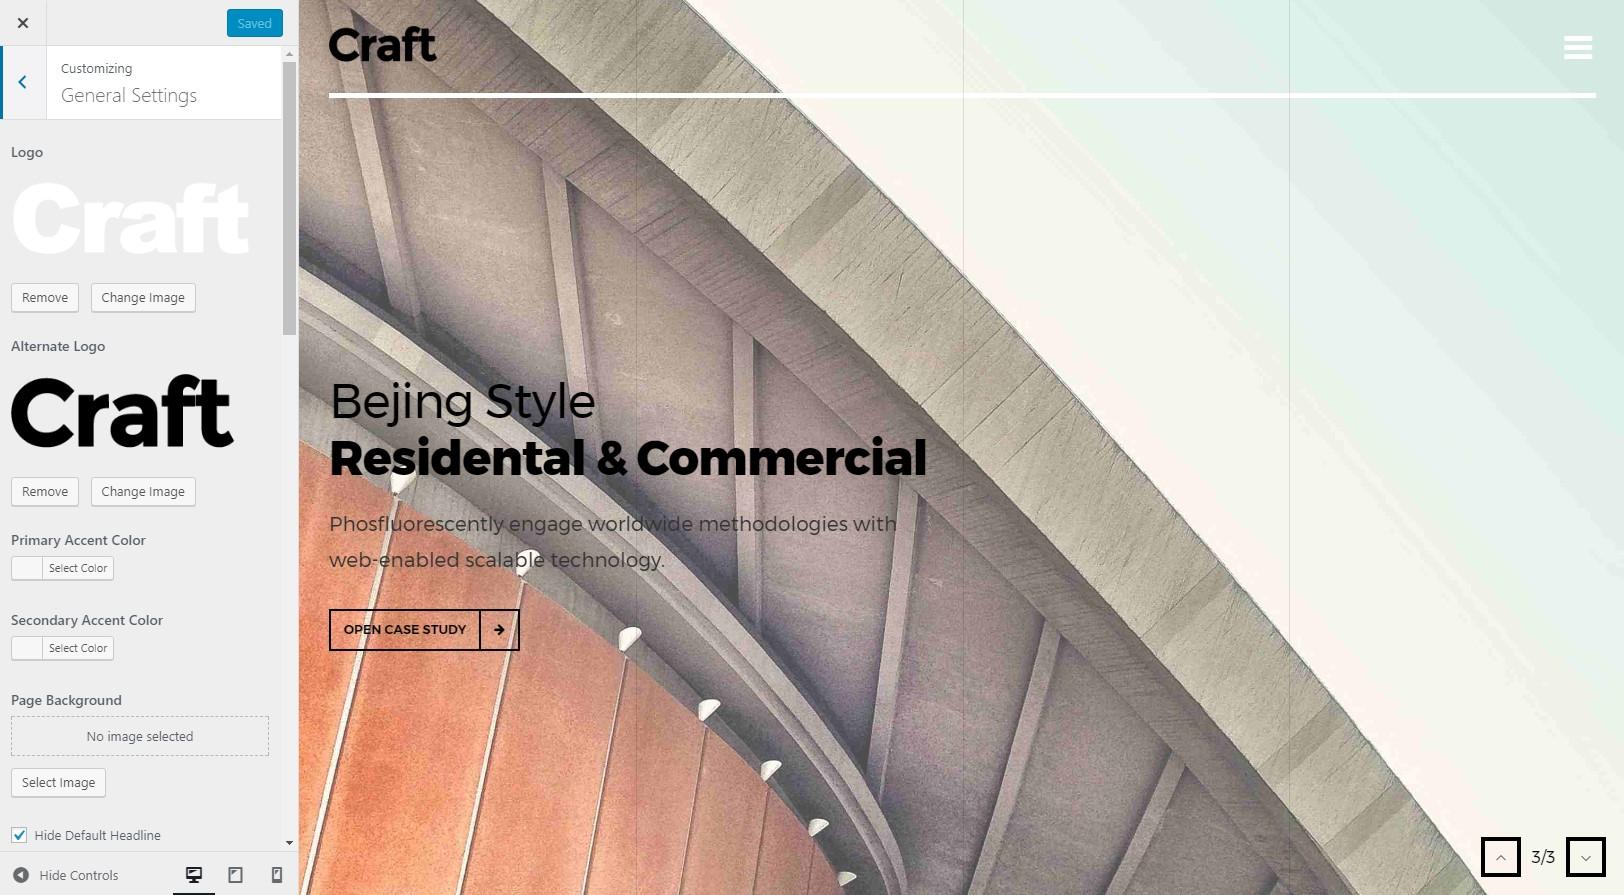 https://documentation.bold-themes.com/craft-portfolio/wp-content/uploads/sites/24/2017/09/general-settings.jpg